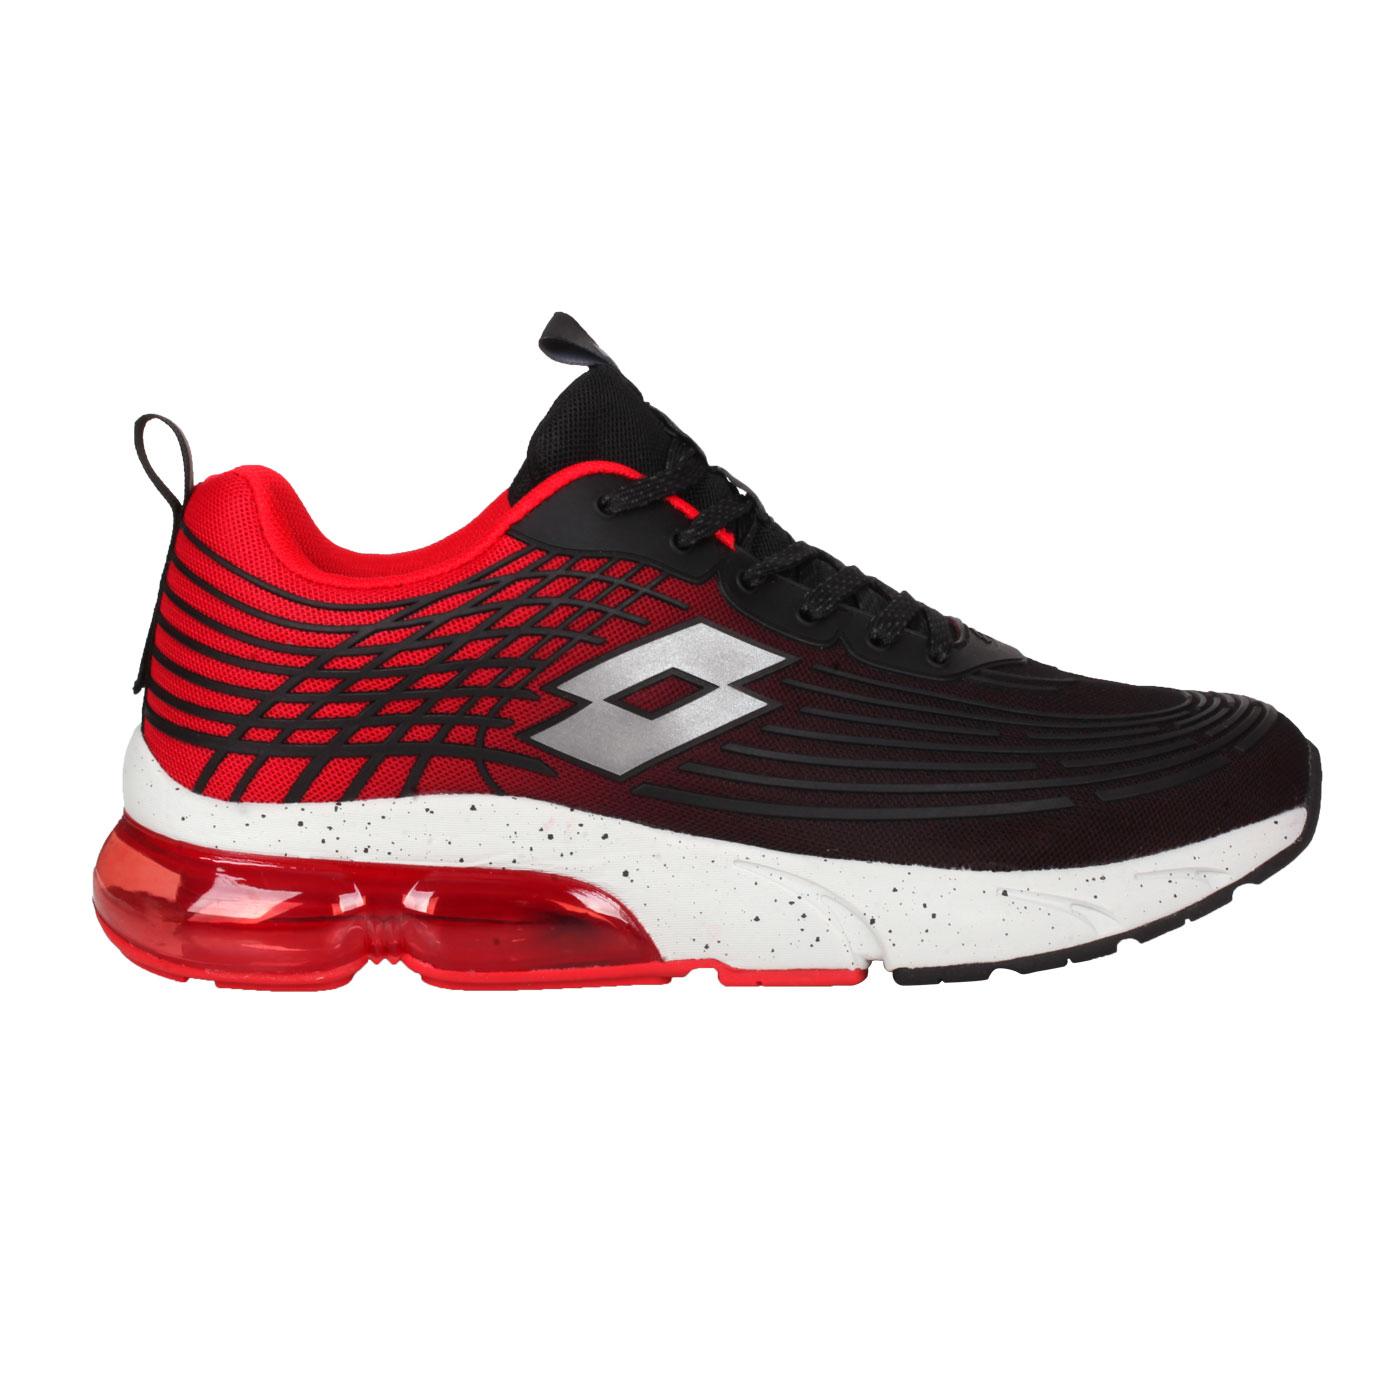 LOTTO 男款休閒運動鞋 LT1AMR3102 - 黑紅銀